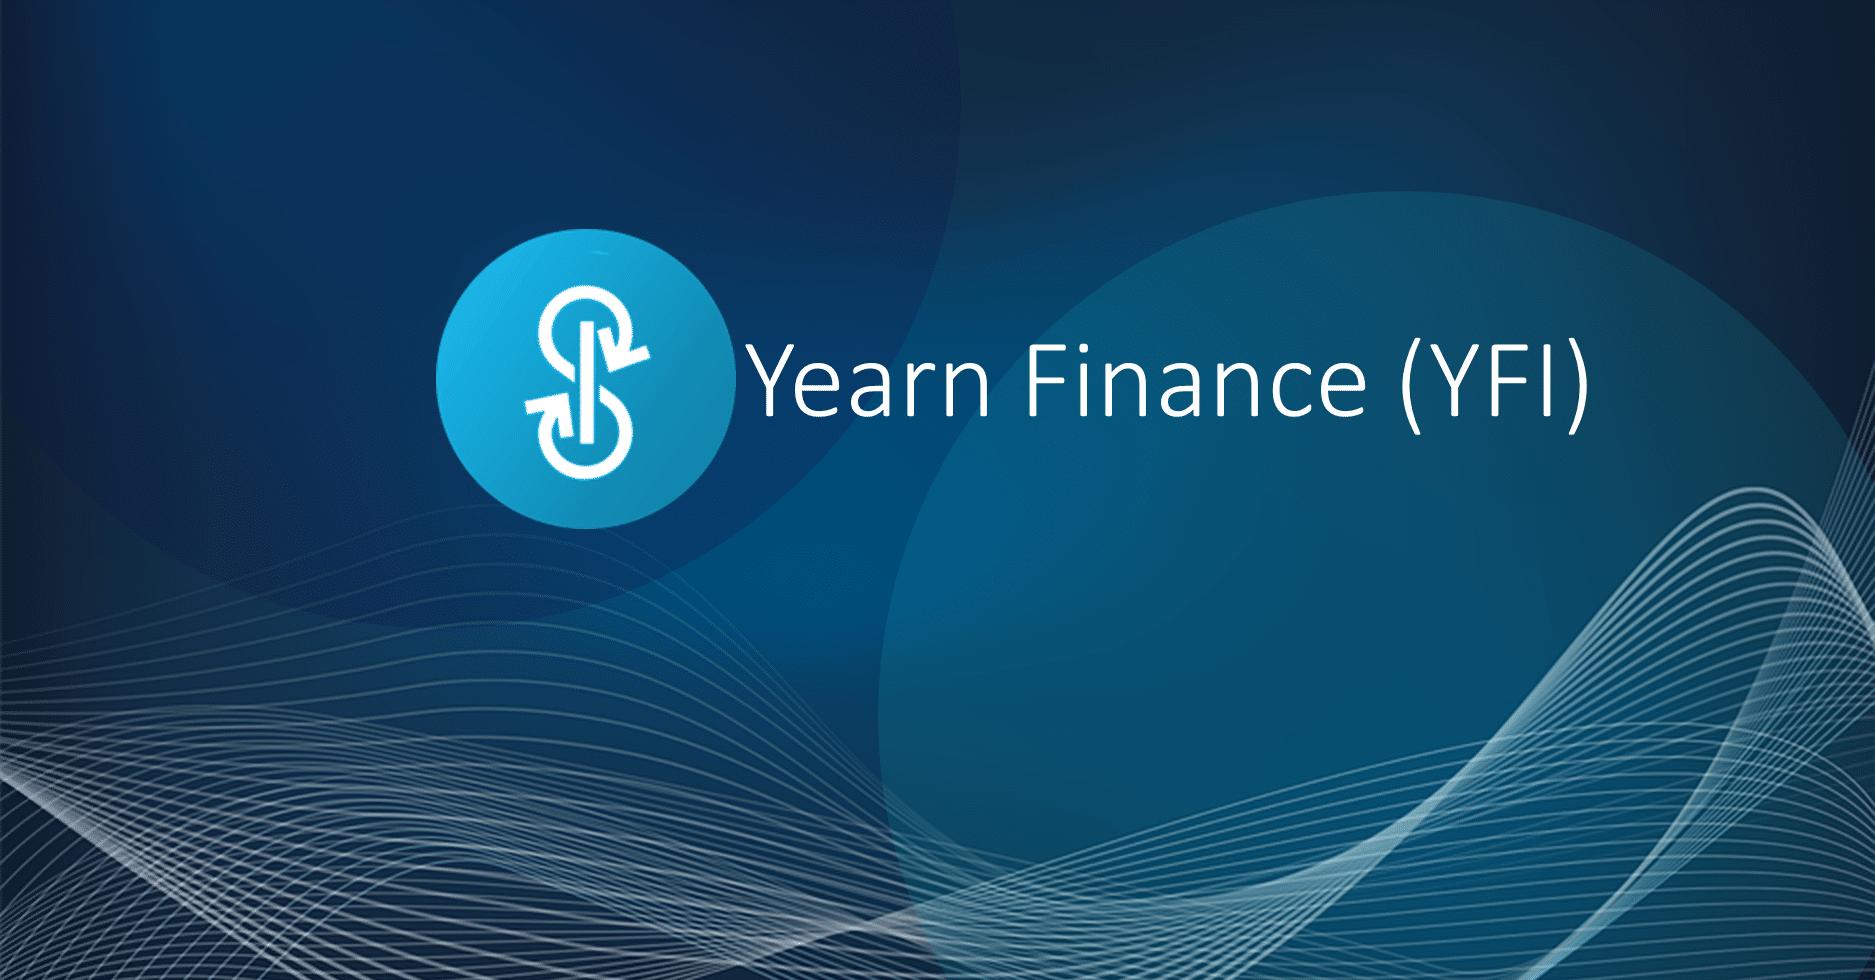 Nuovo all time high per Yearn Finance (YFI)